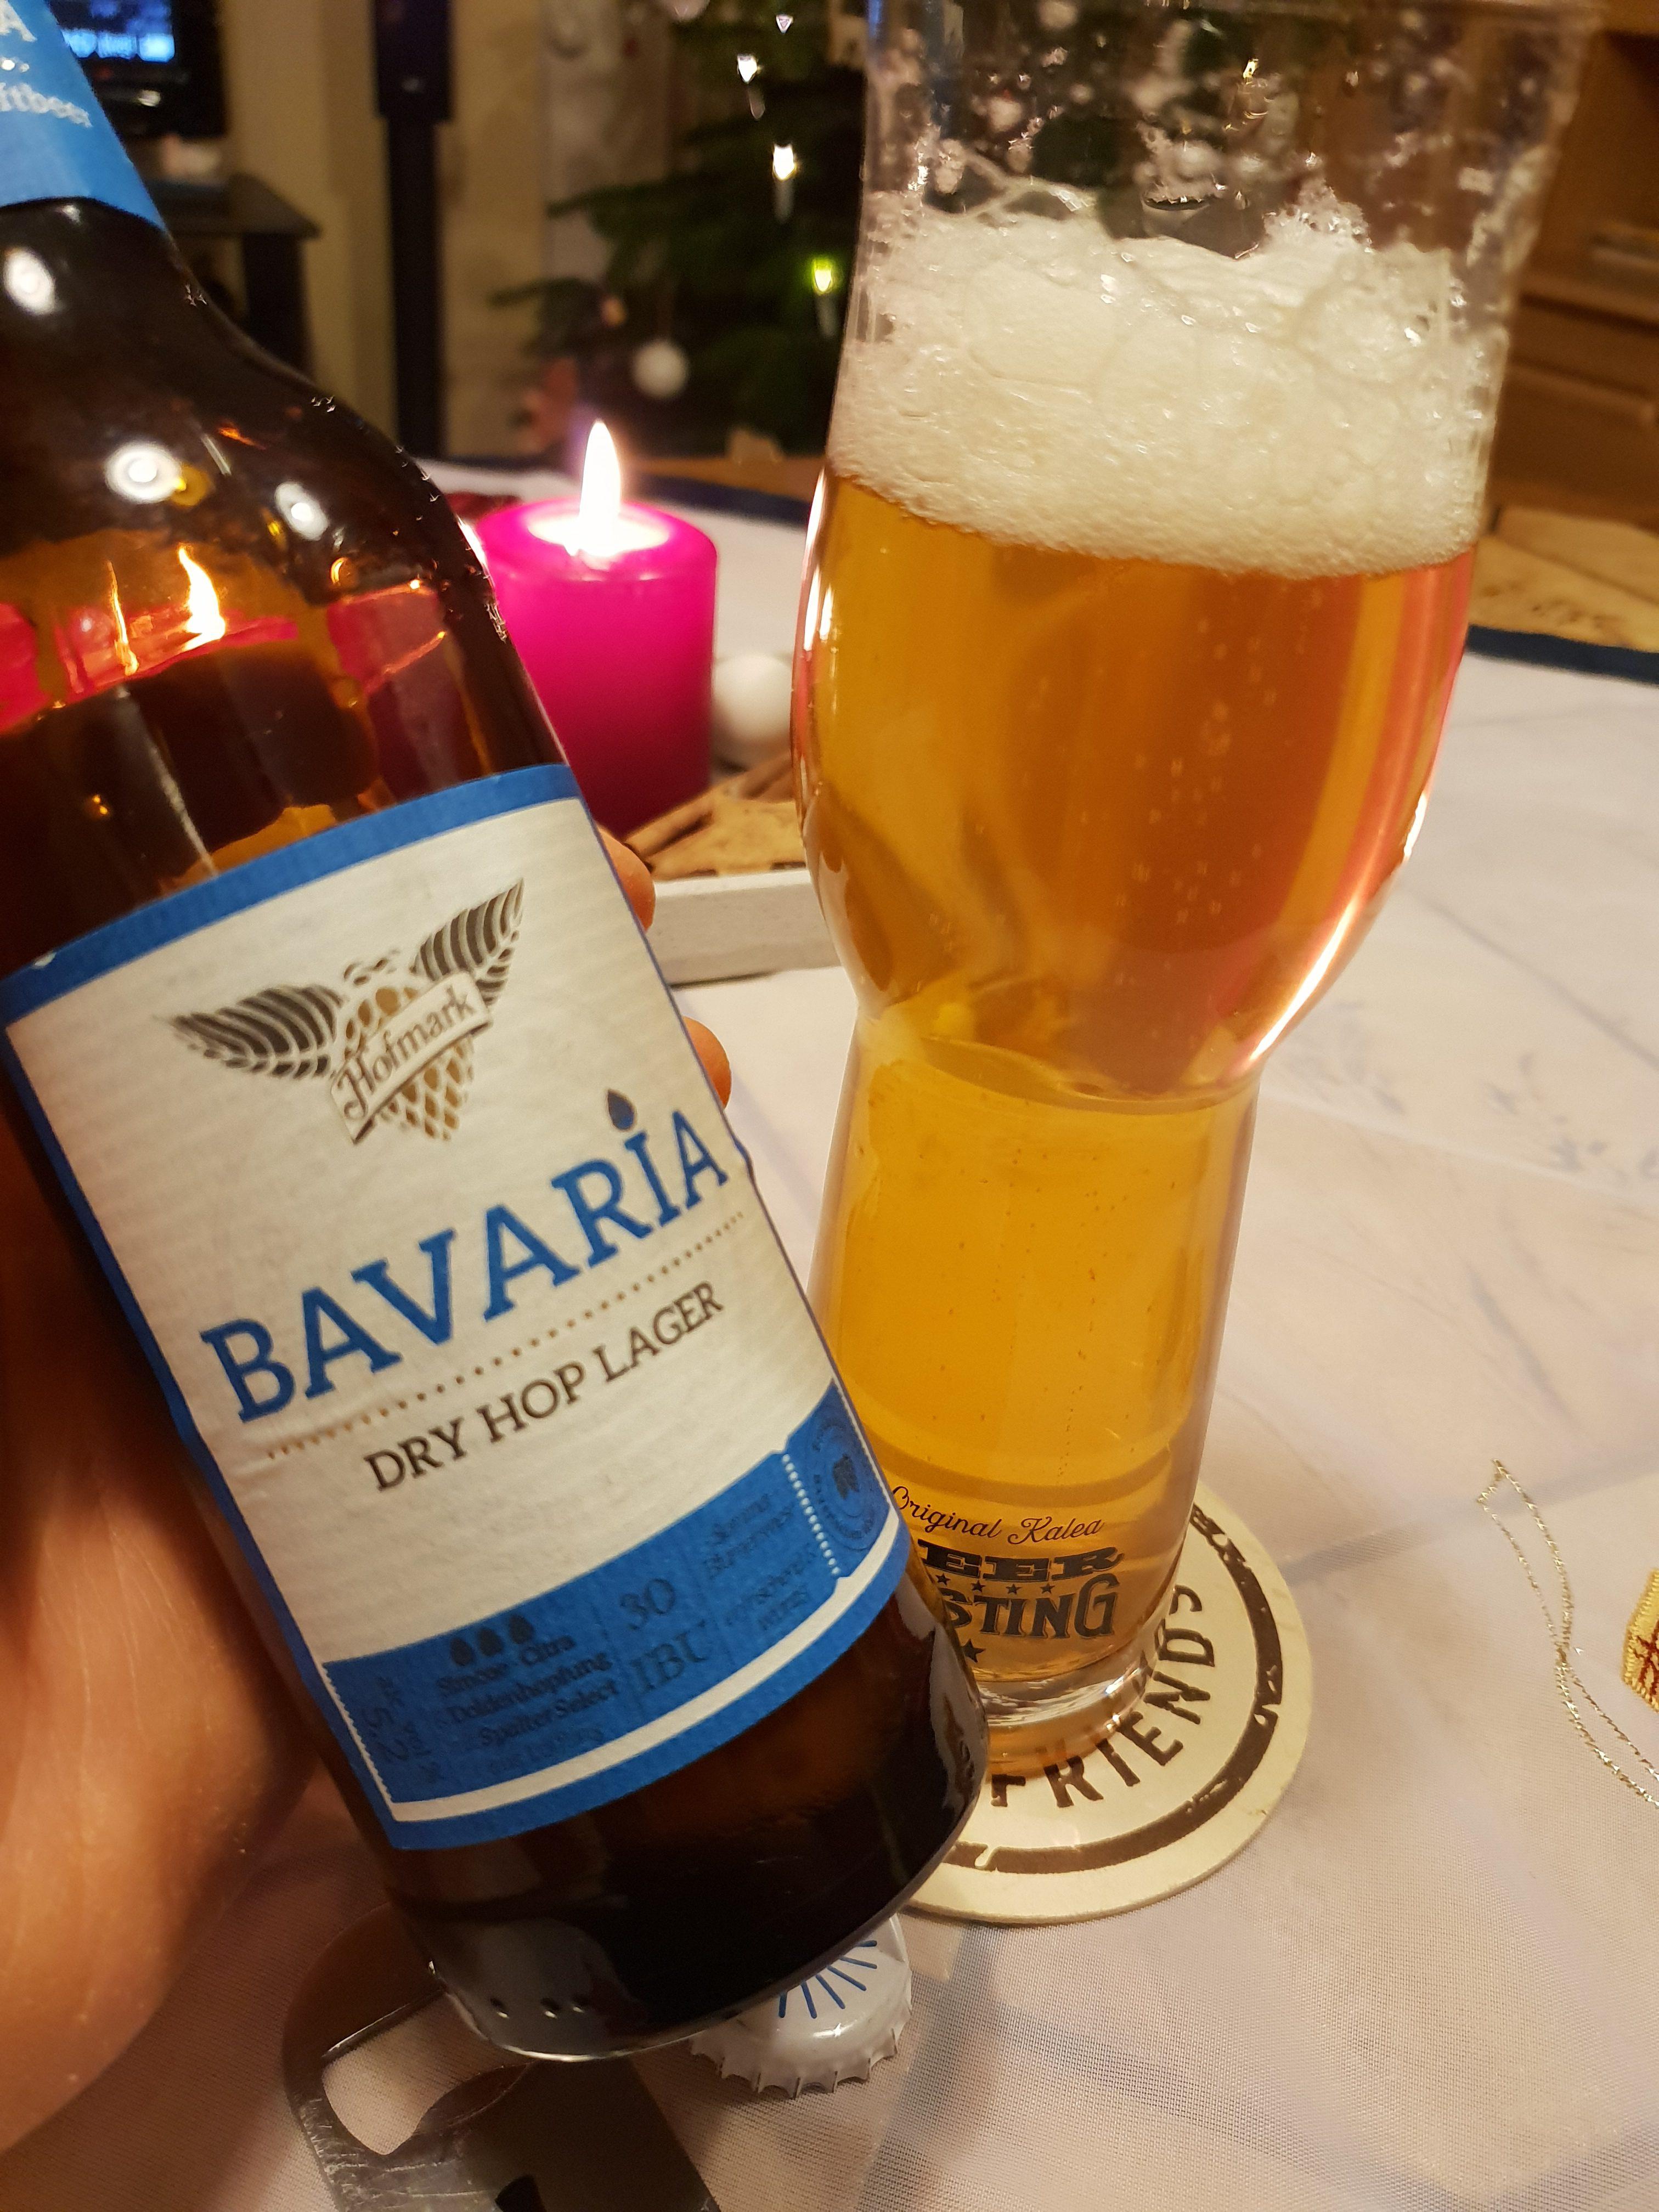 Bieradvent (Deutsche Edition) Hofmark – Dry Hop Lager